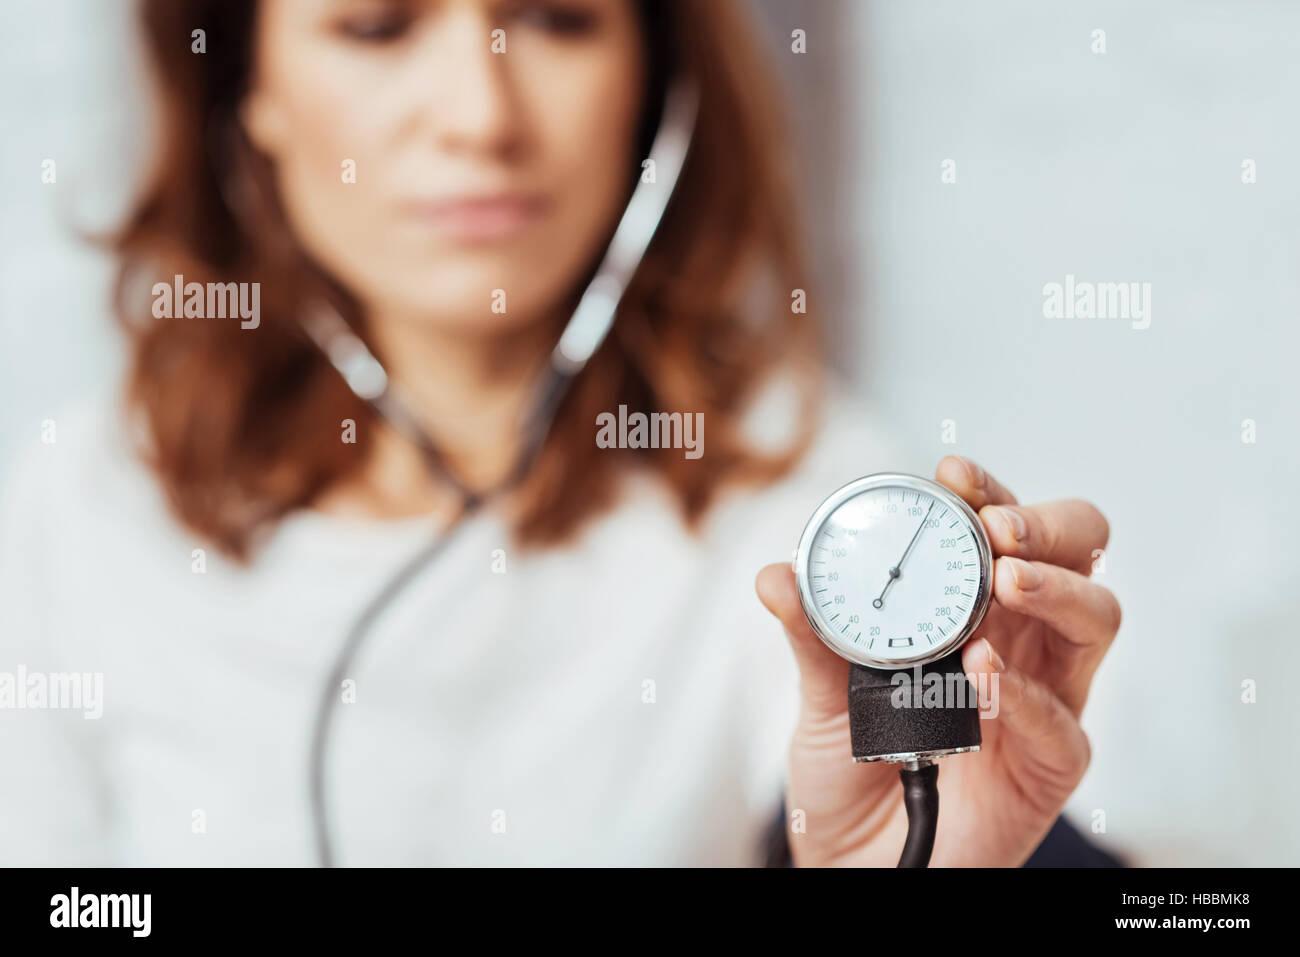 Selective focus of tonometer for measuring pressure - Stock Image